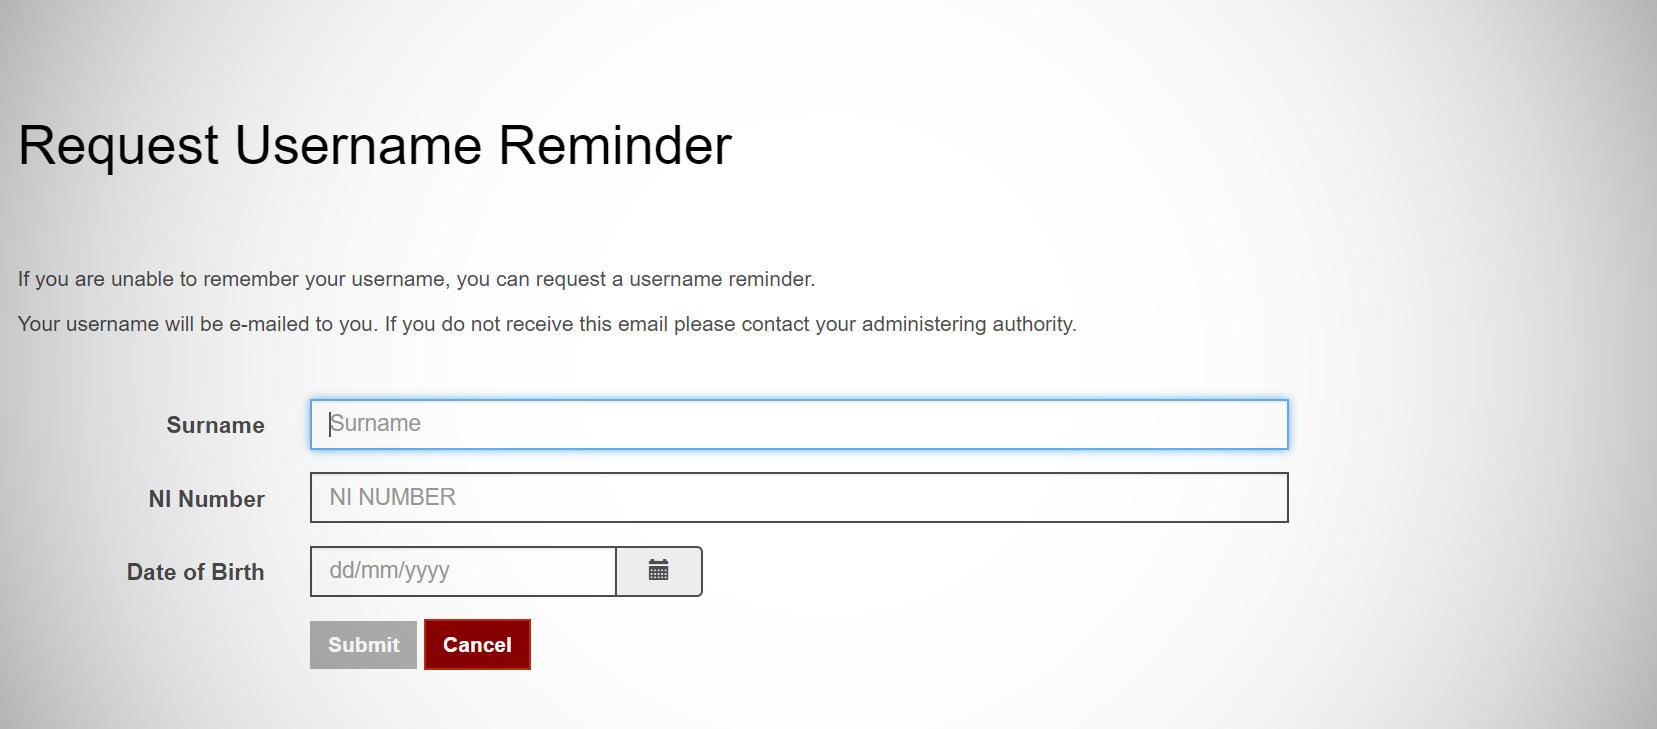 Username reminder screen capture